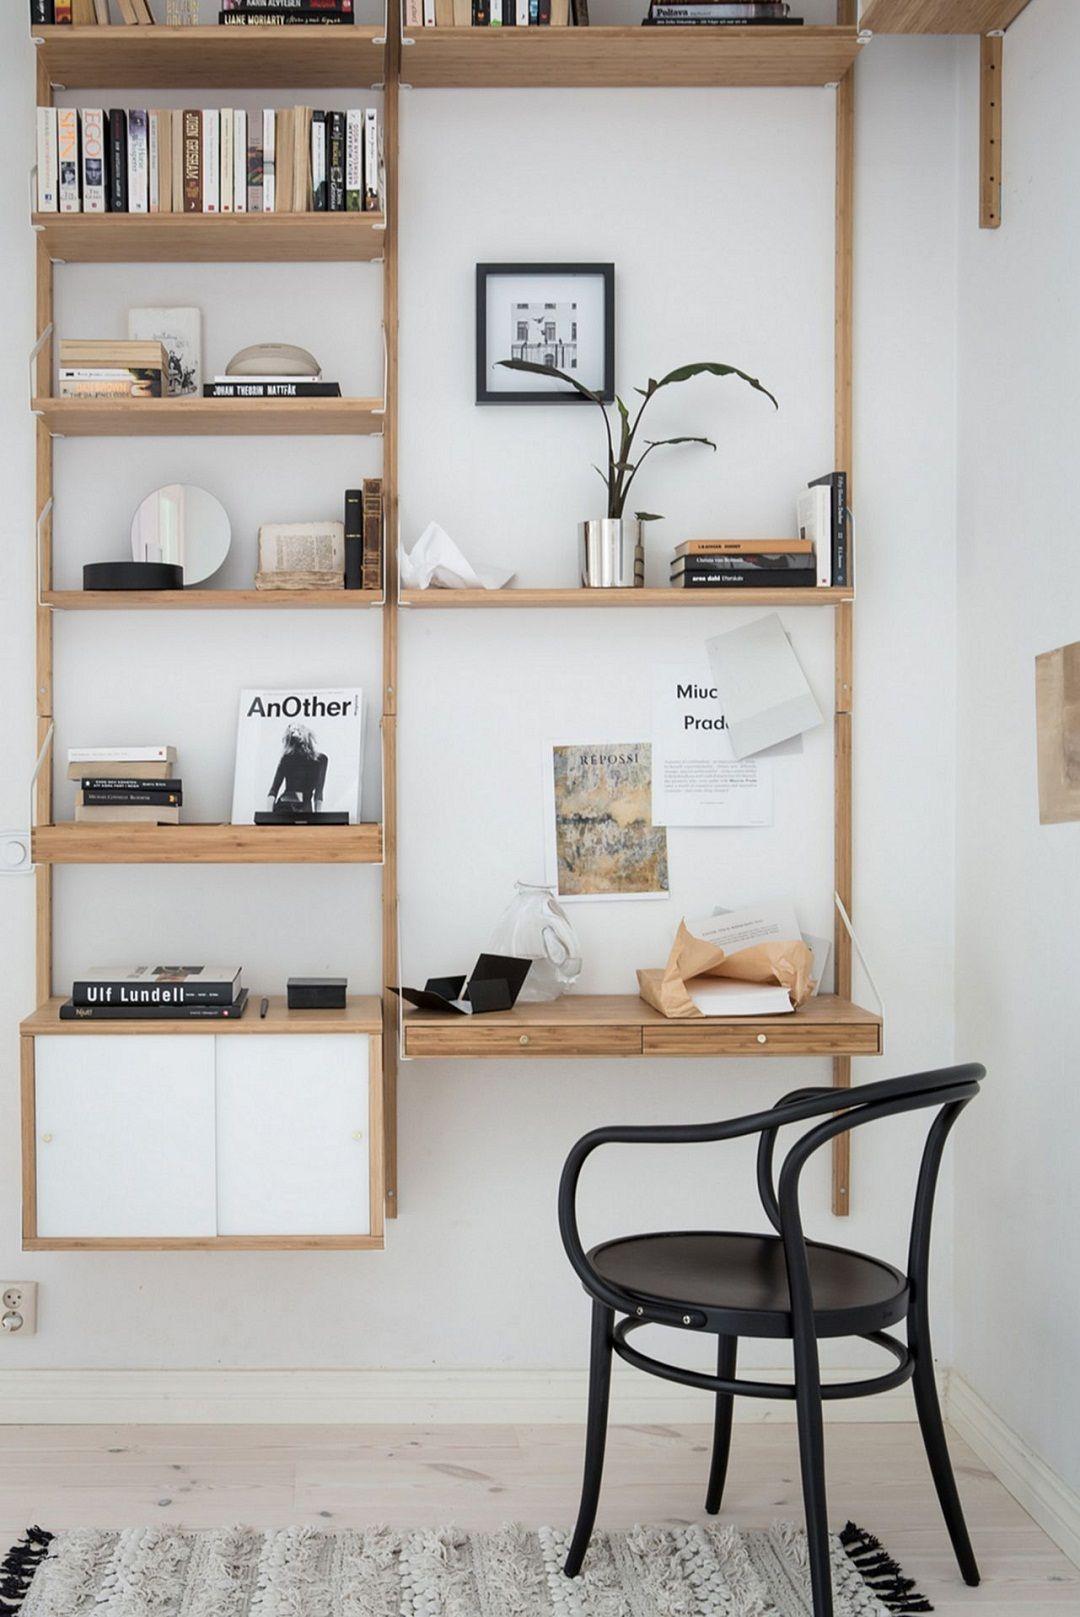 25 Best Office Shelf Design Decor Ideas To Inspire You Ikea Interior Home Office Decor Home Office Design